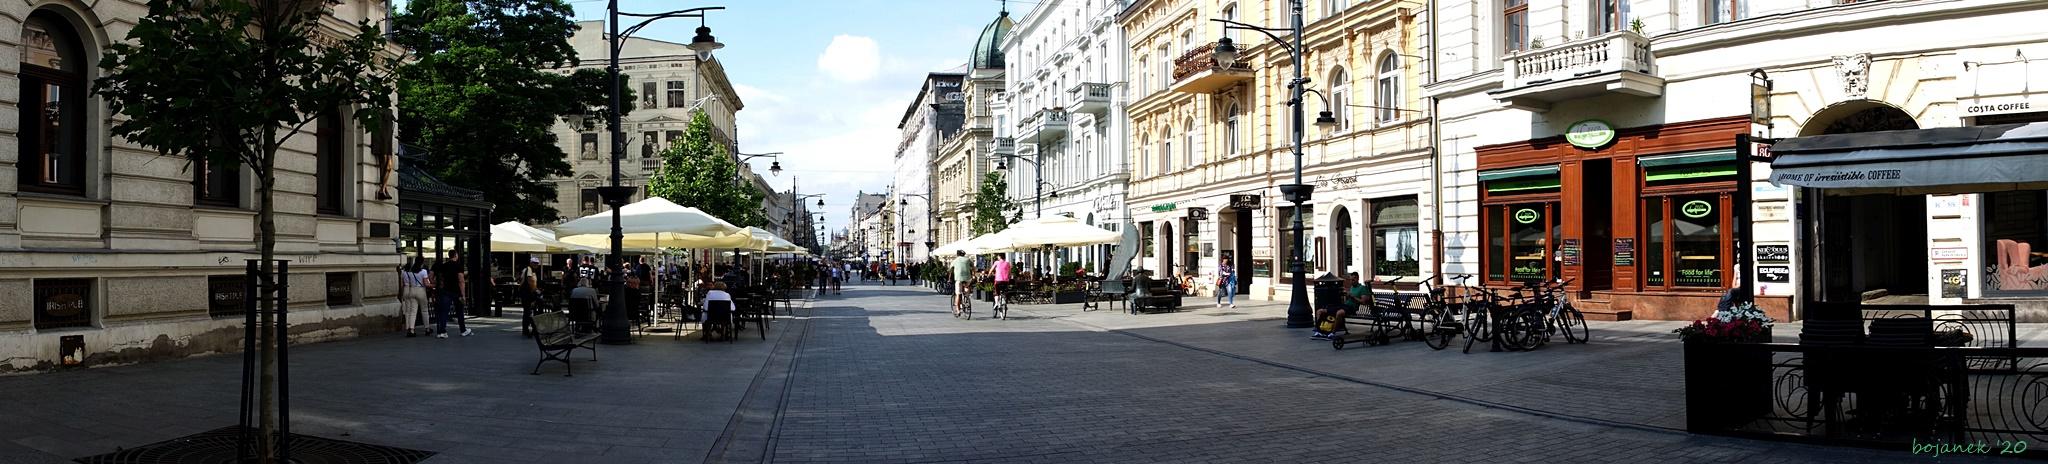 Piotrkowska 20